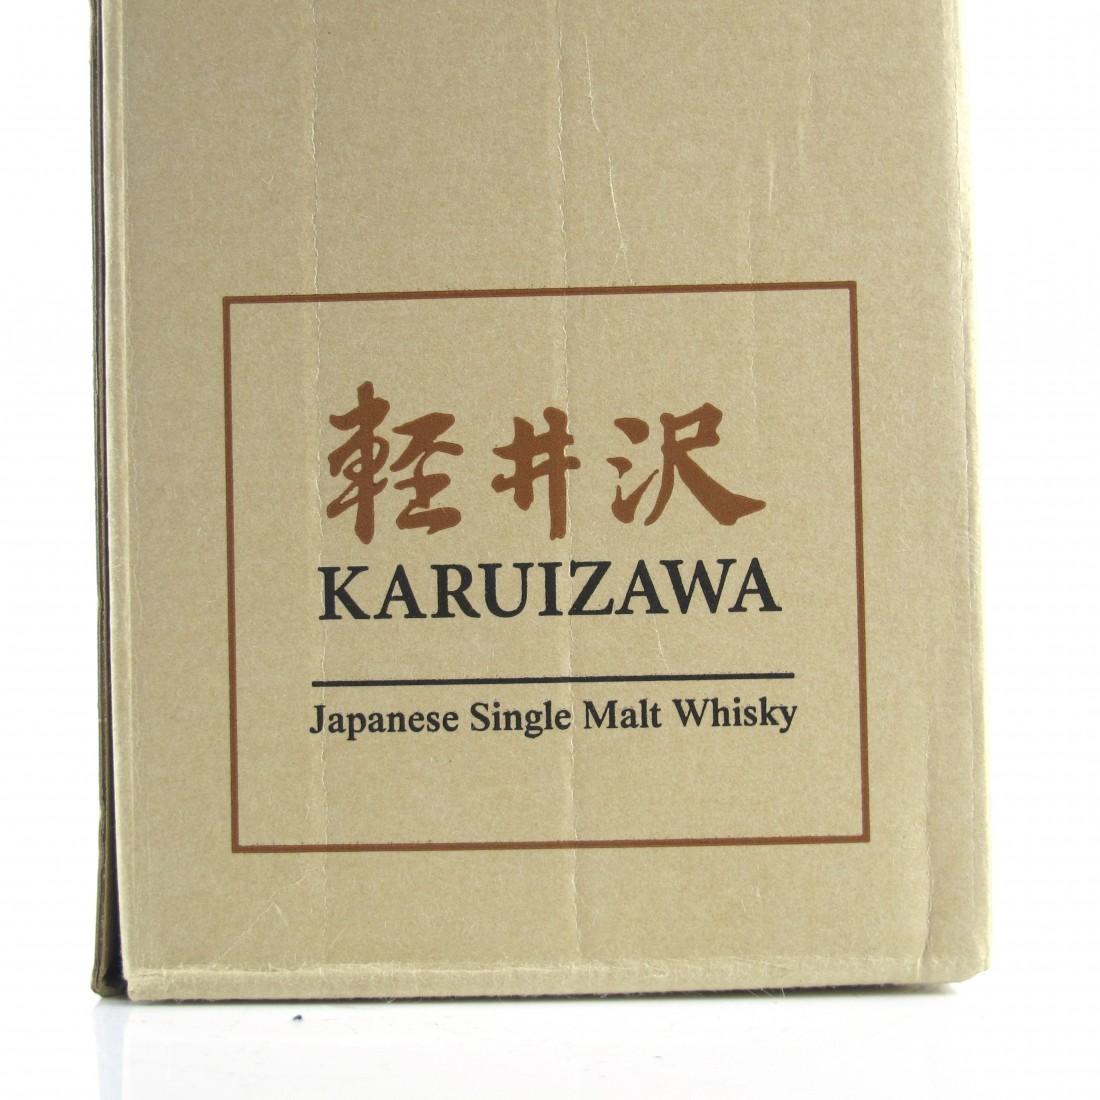 Karuizawa 1999/2000 Cask Strength 3rd Edition